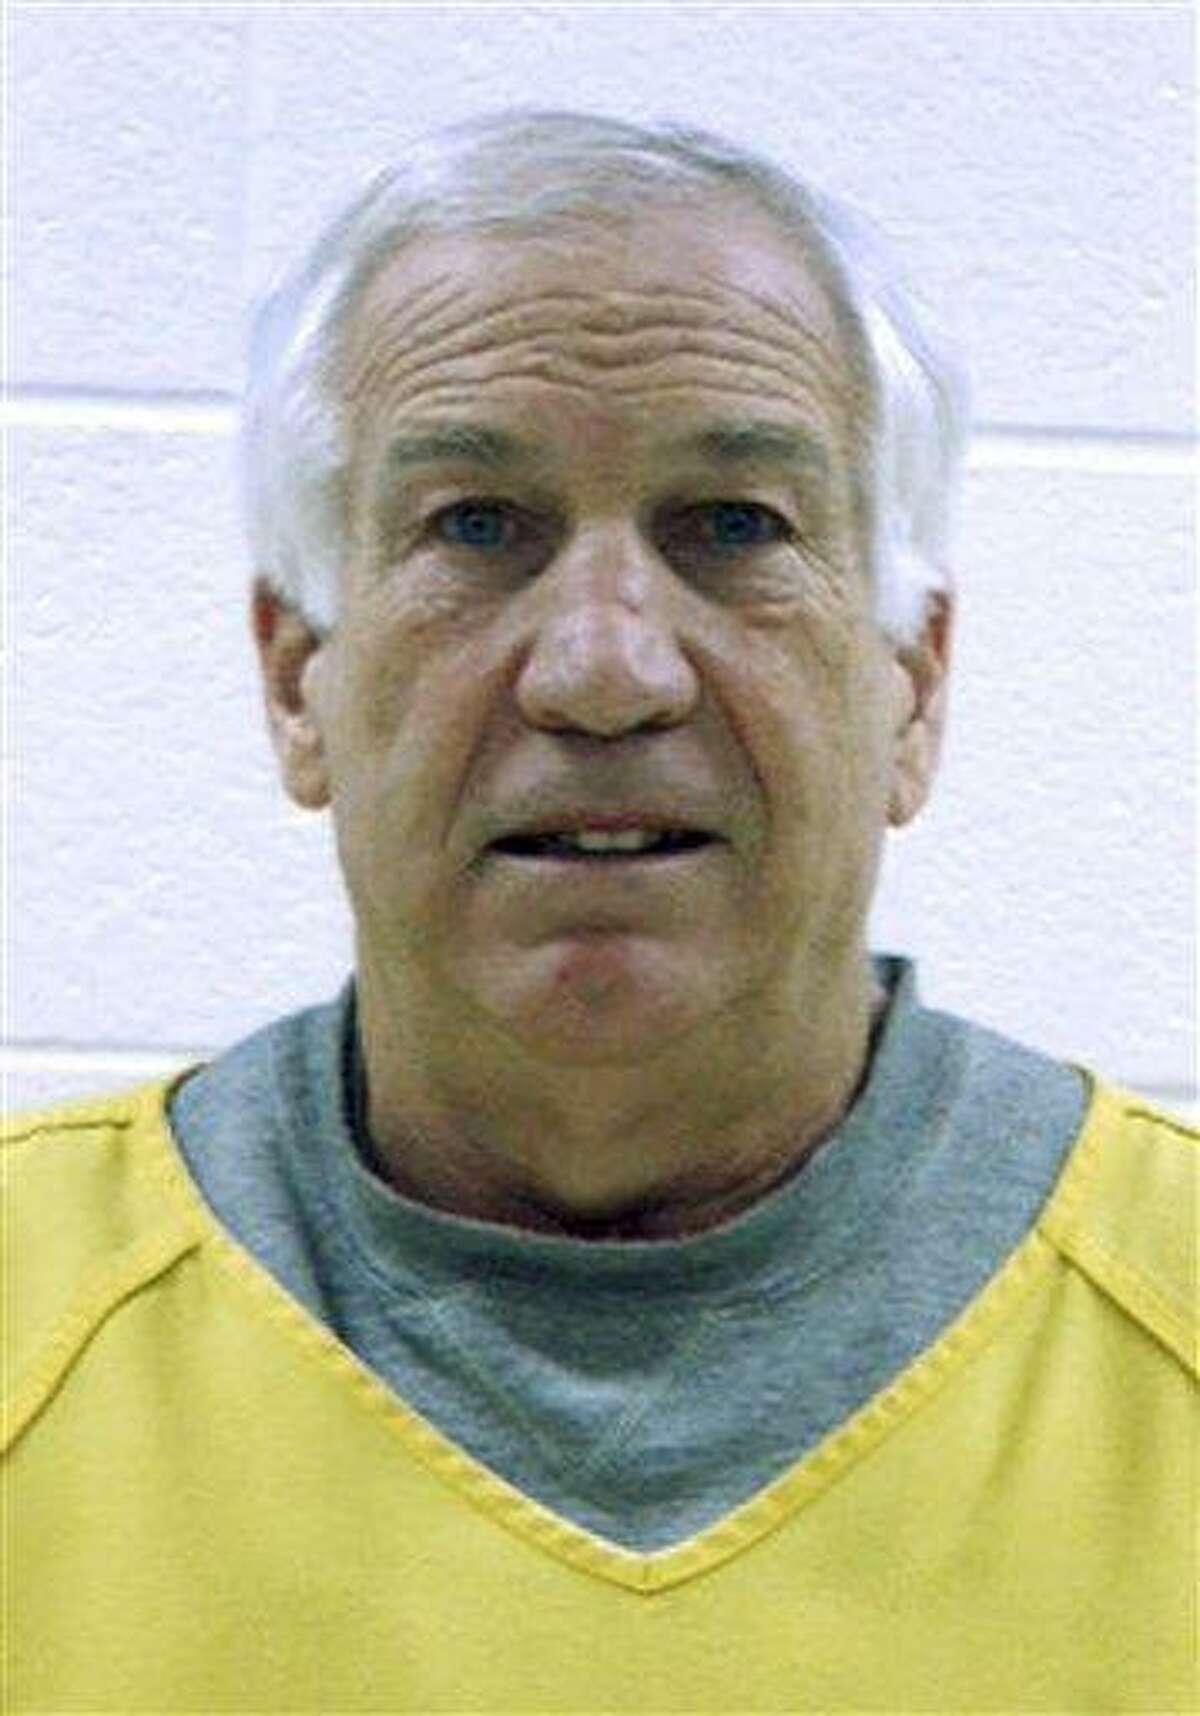 Sandusky at his arraignment in 2011 Associated Press